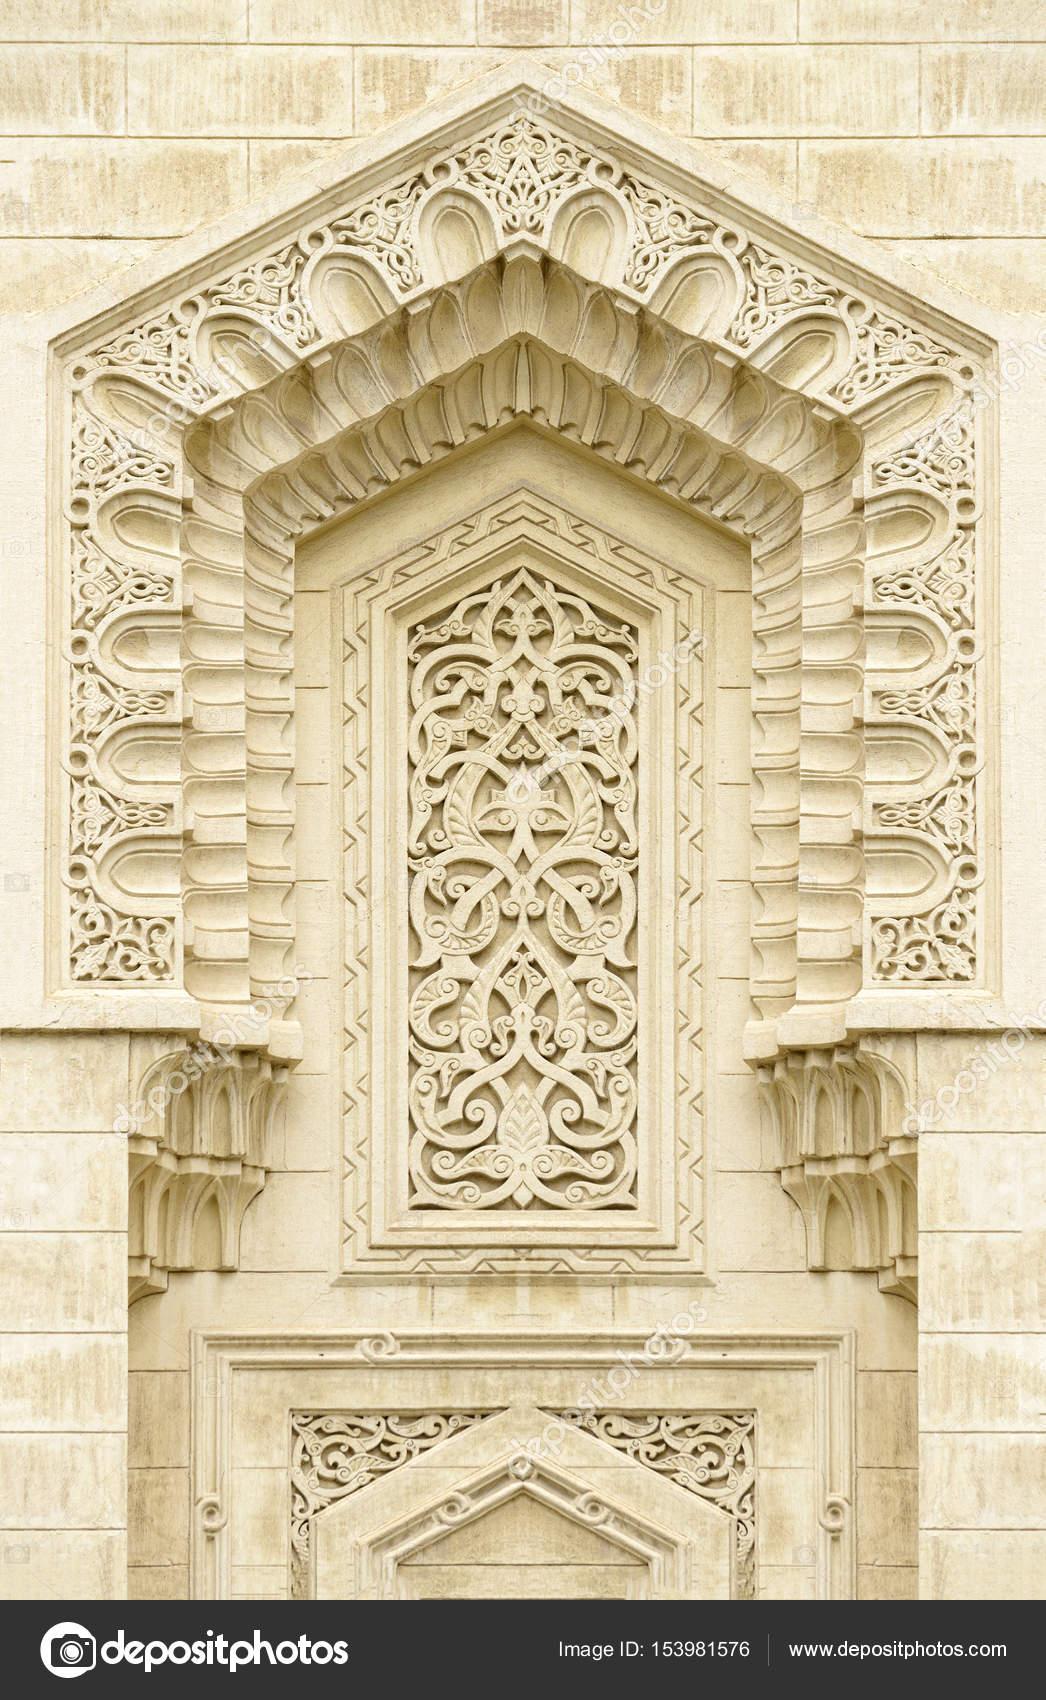 Decorative Islamic Wall Art — Stock Photo © MidoSemsem #153981576